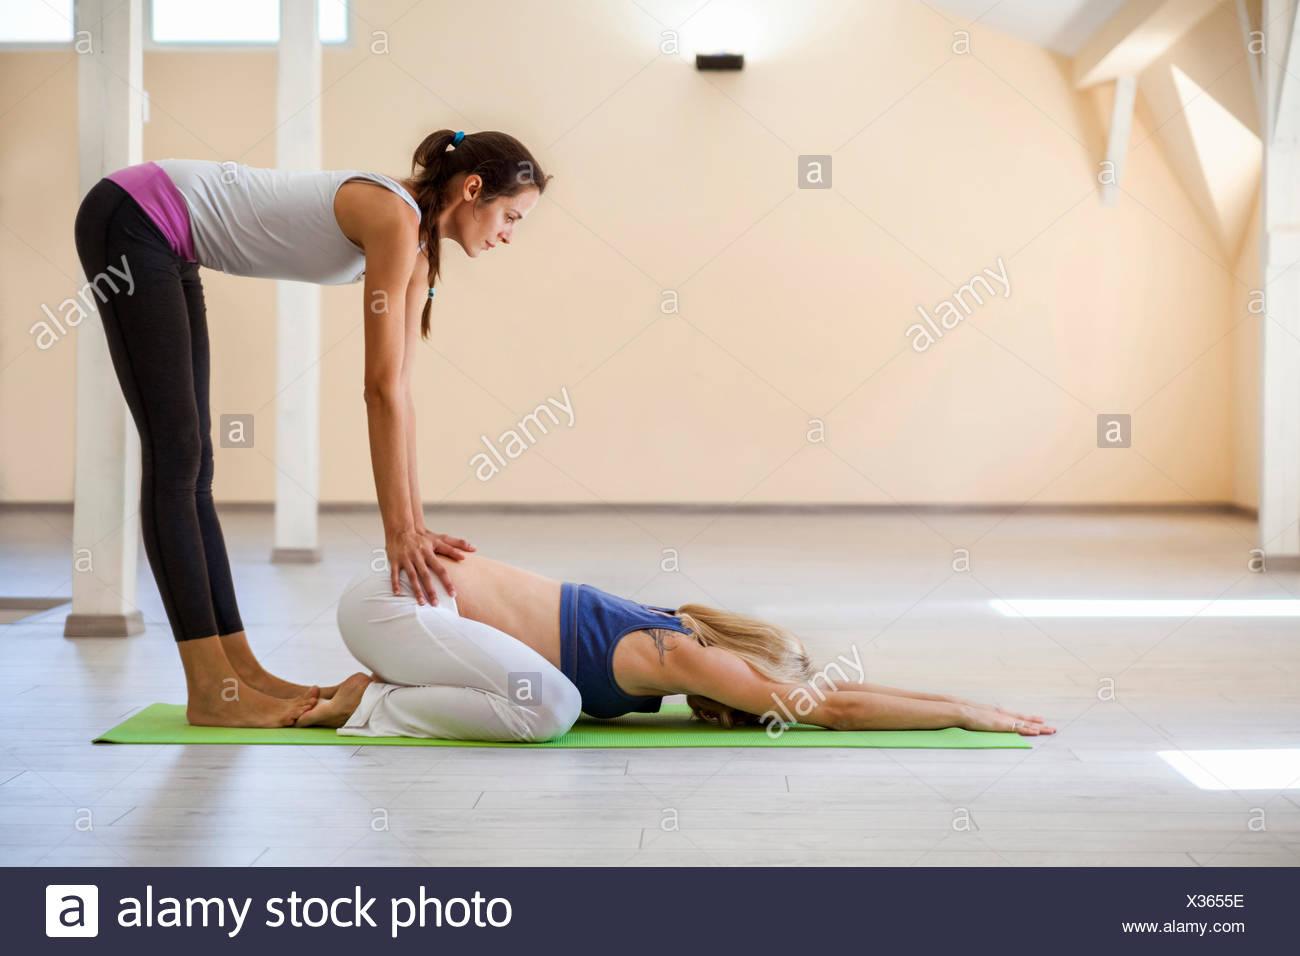 Prenatal Yoga Female Yoga Instructor Child Position Stock Photo